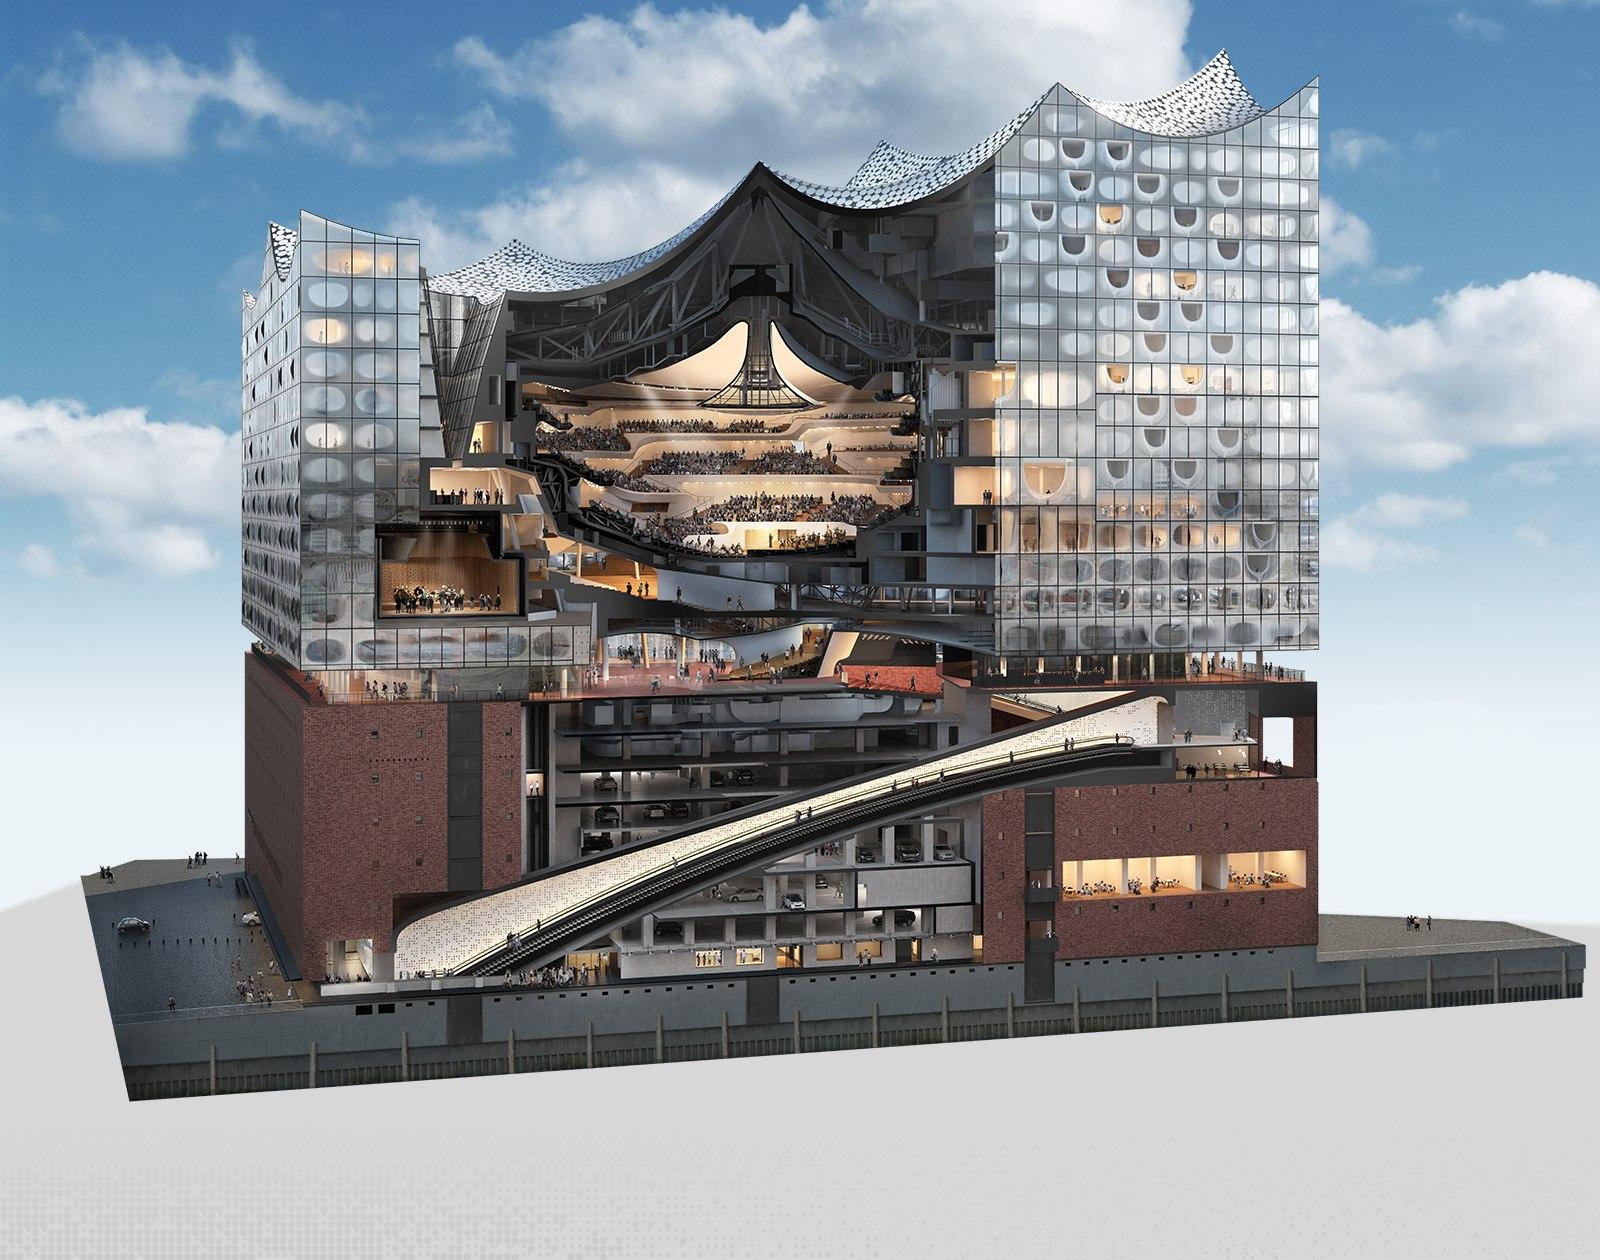 Abenteuer Elbphilharmonie Hamburg